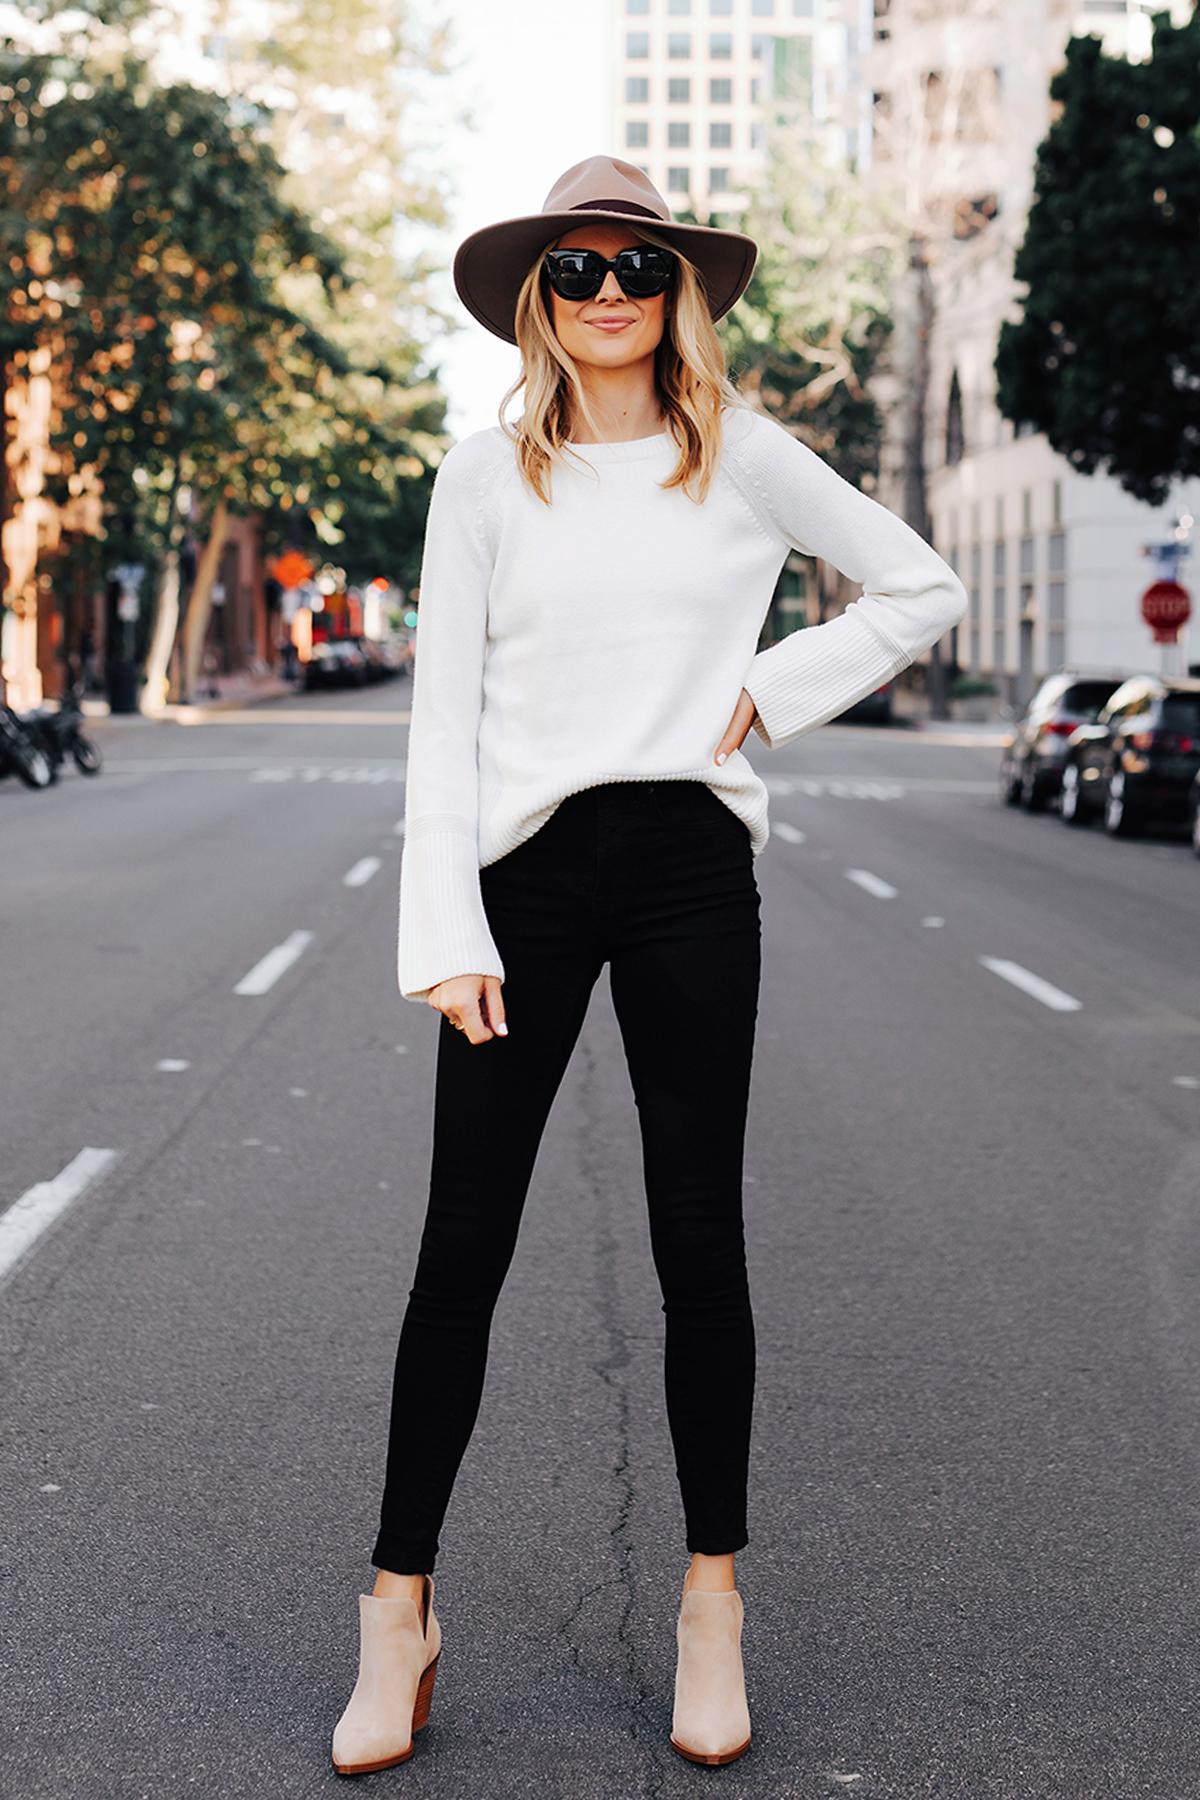 Fashion Jackson Wearing Ann Taylor Floppy Wool Hat Ann Taylor White Sweater Black Skinny Jeans Tan Booties